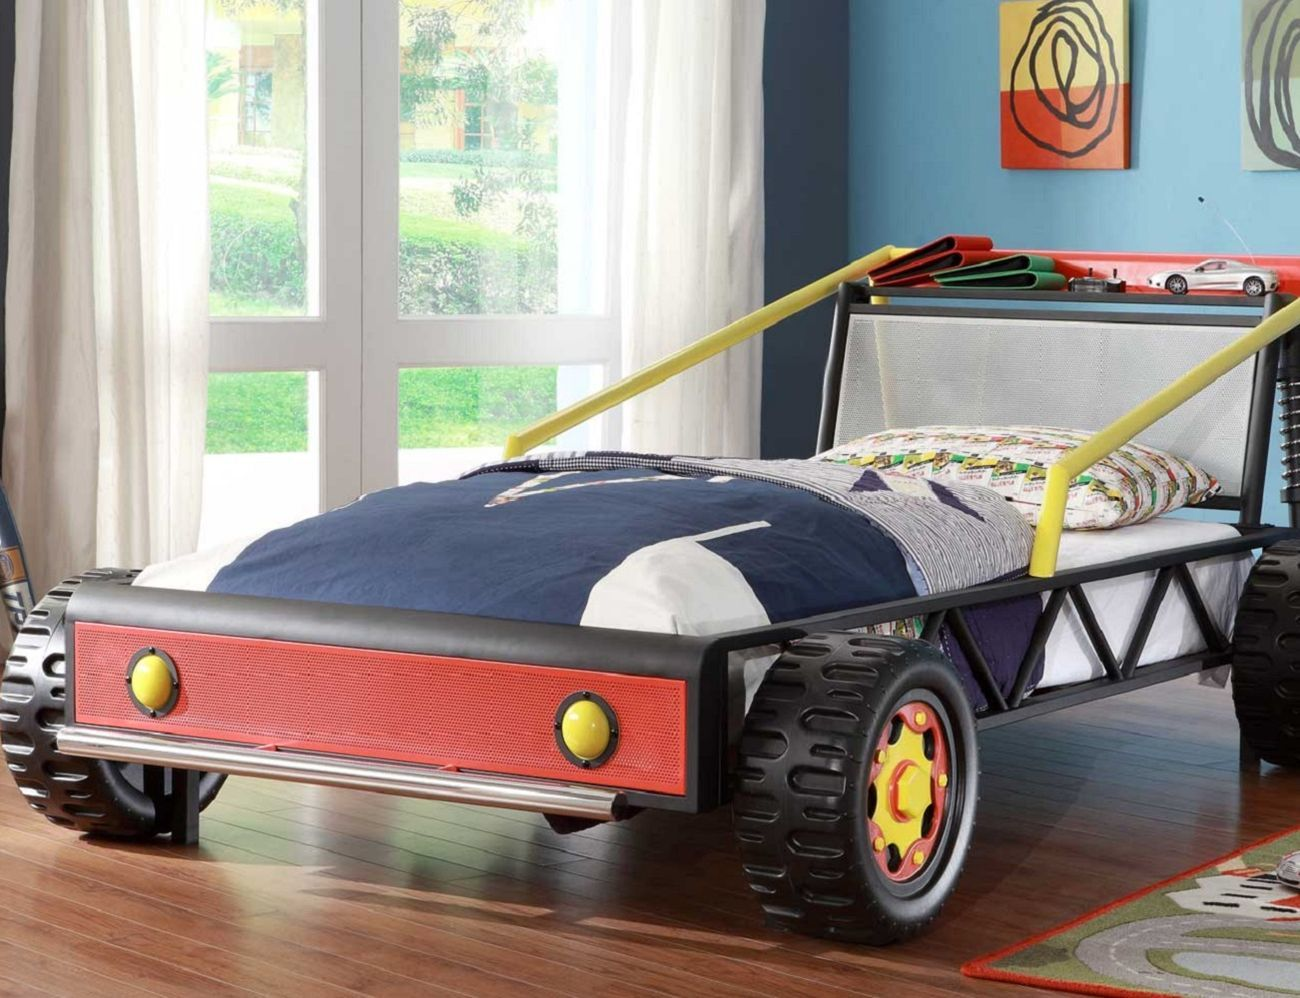 Kiran Race Car Platform Bed For Toddlers